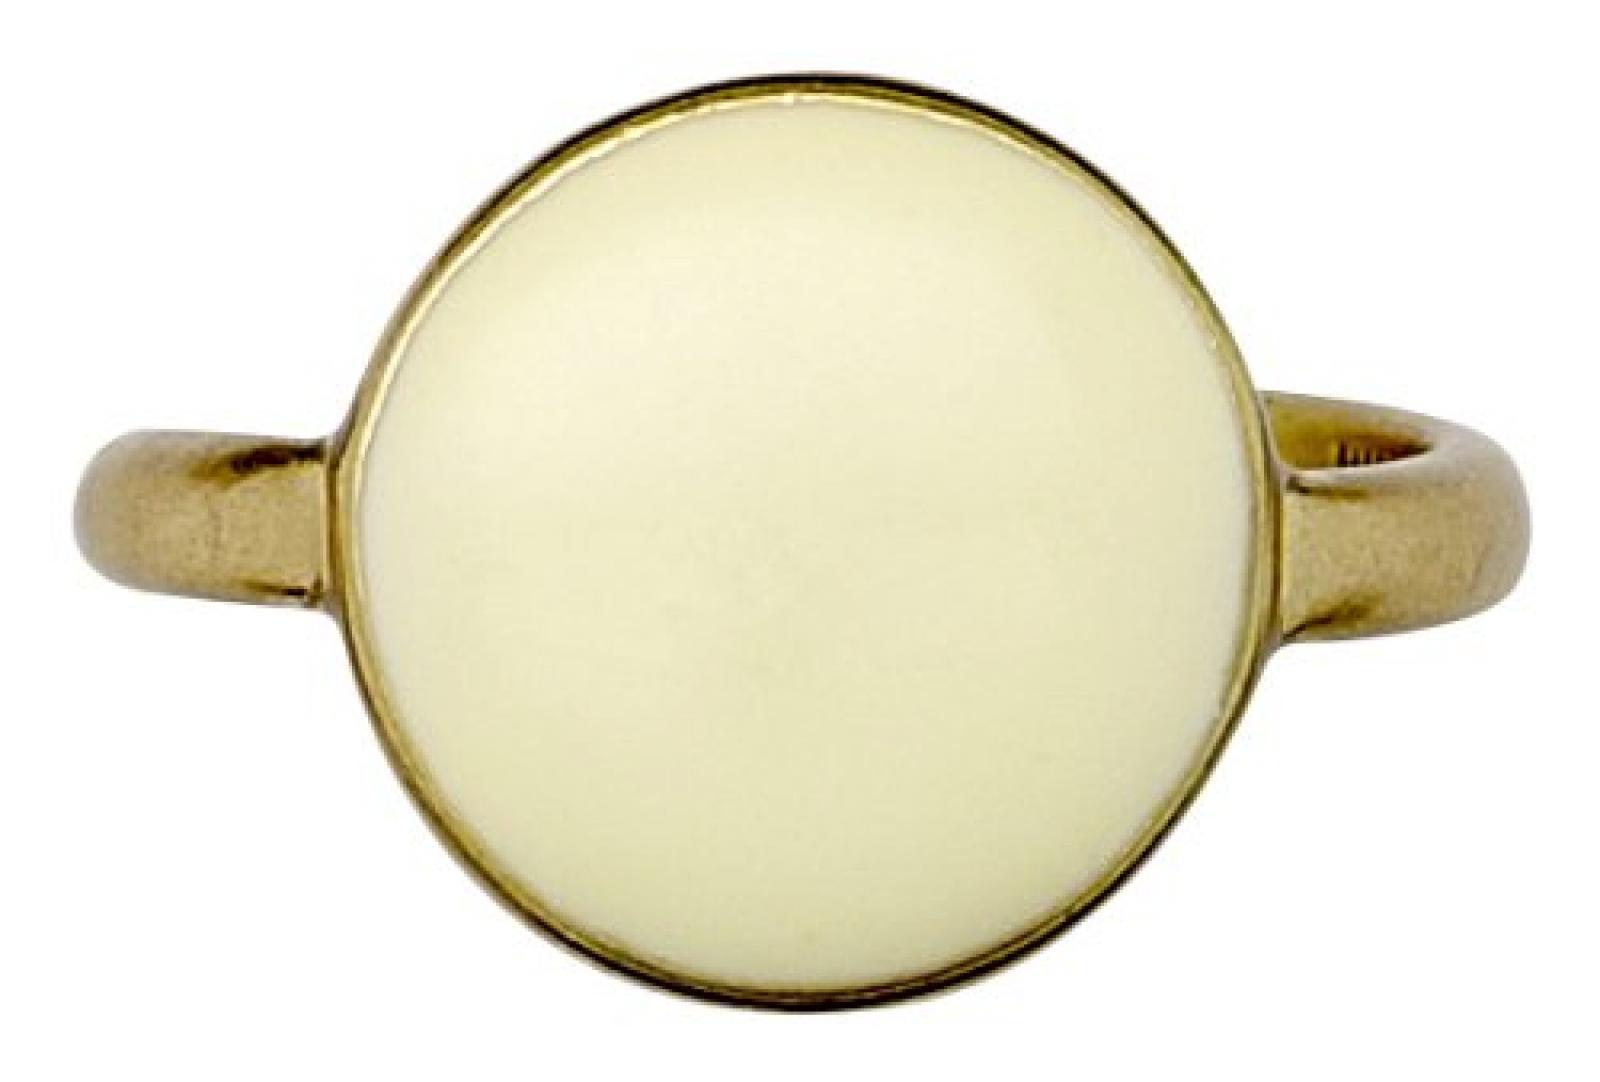 Pilgrim Jewelry Damen-Ring Messing aus der Serie Free Spirit vergoldet,gelb 1.5 cm Gr. 53 (16.9) 191322804